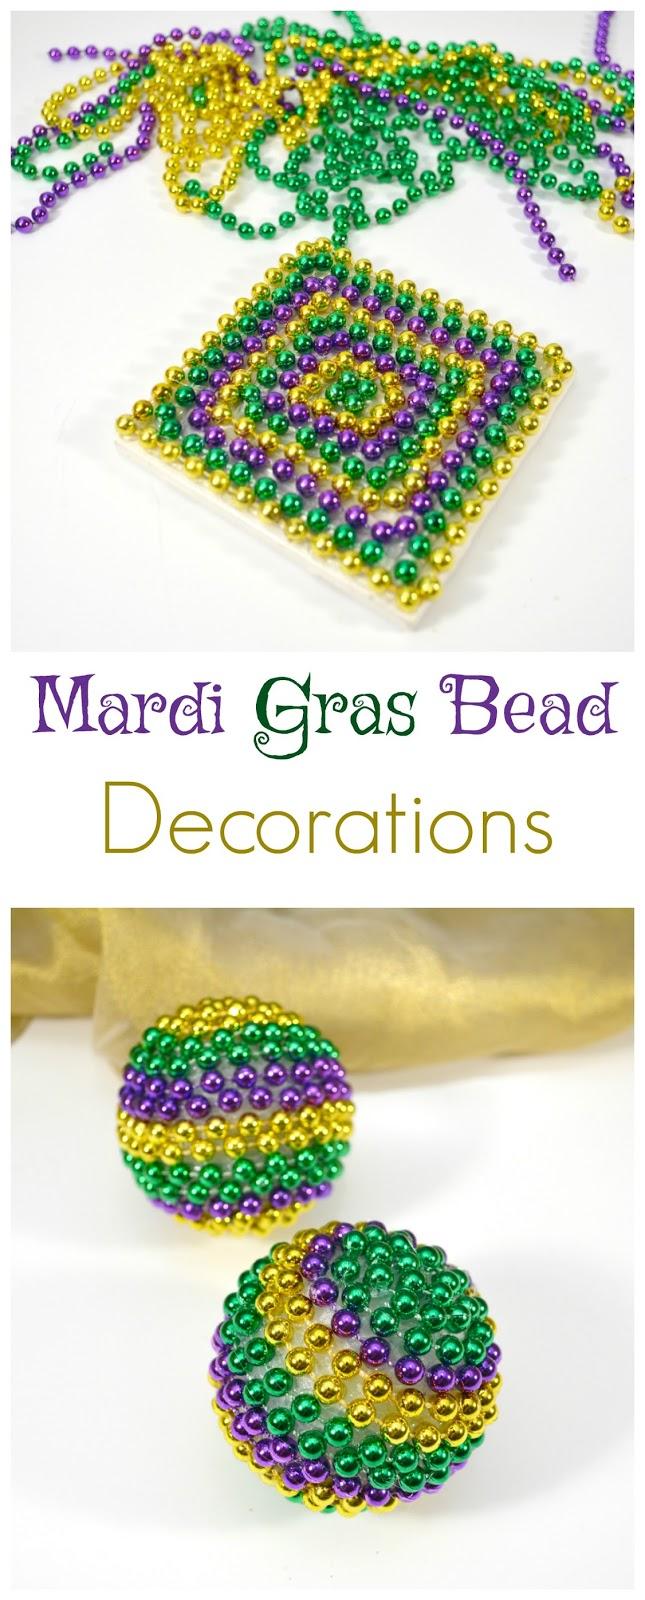 Mardi gras strip for beads